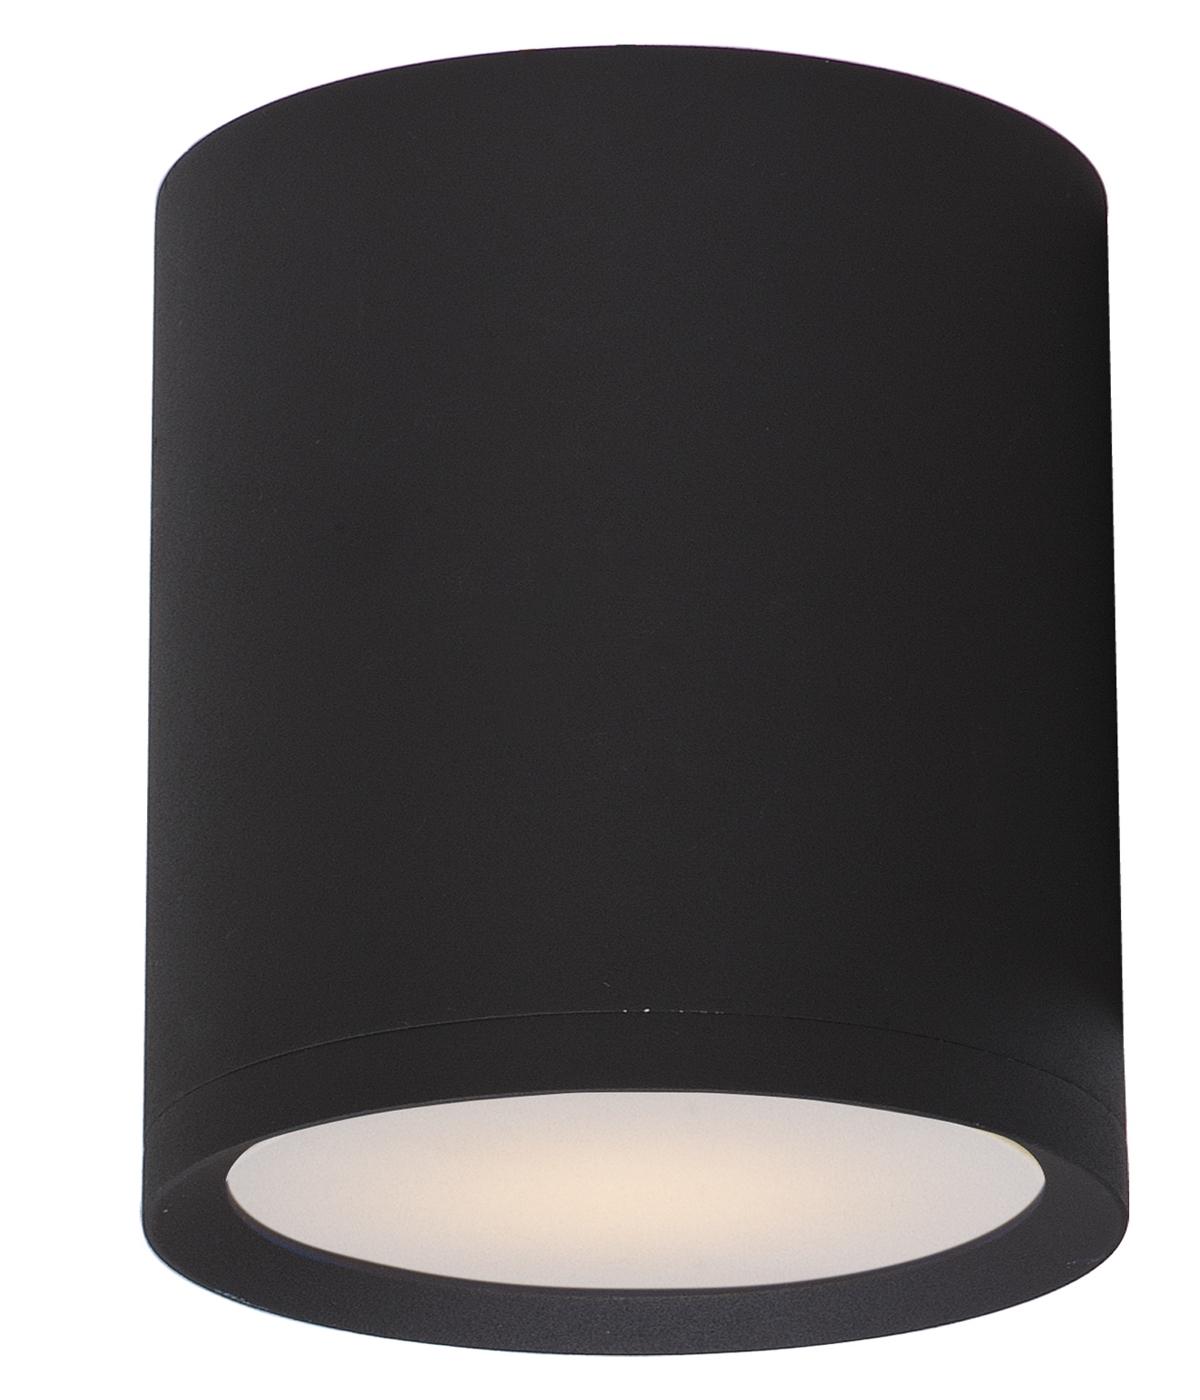 Outdoor Ceiling Lighting Australia – Coryc Pertaining To Best And Newest Outdoor Ceiling Lights At Amazon (View 12 of 20)